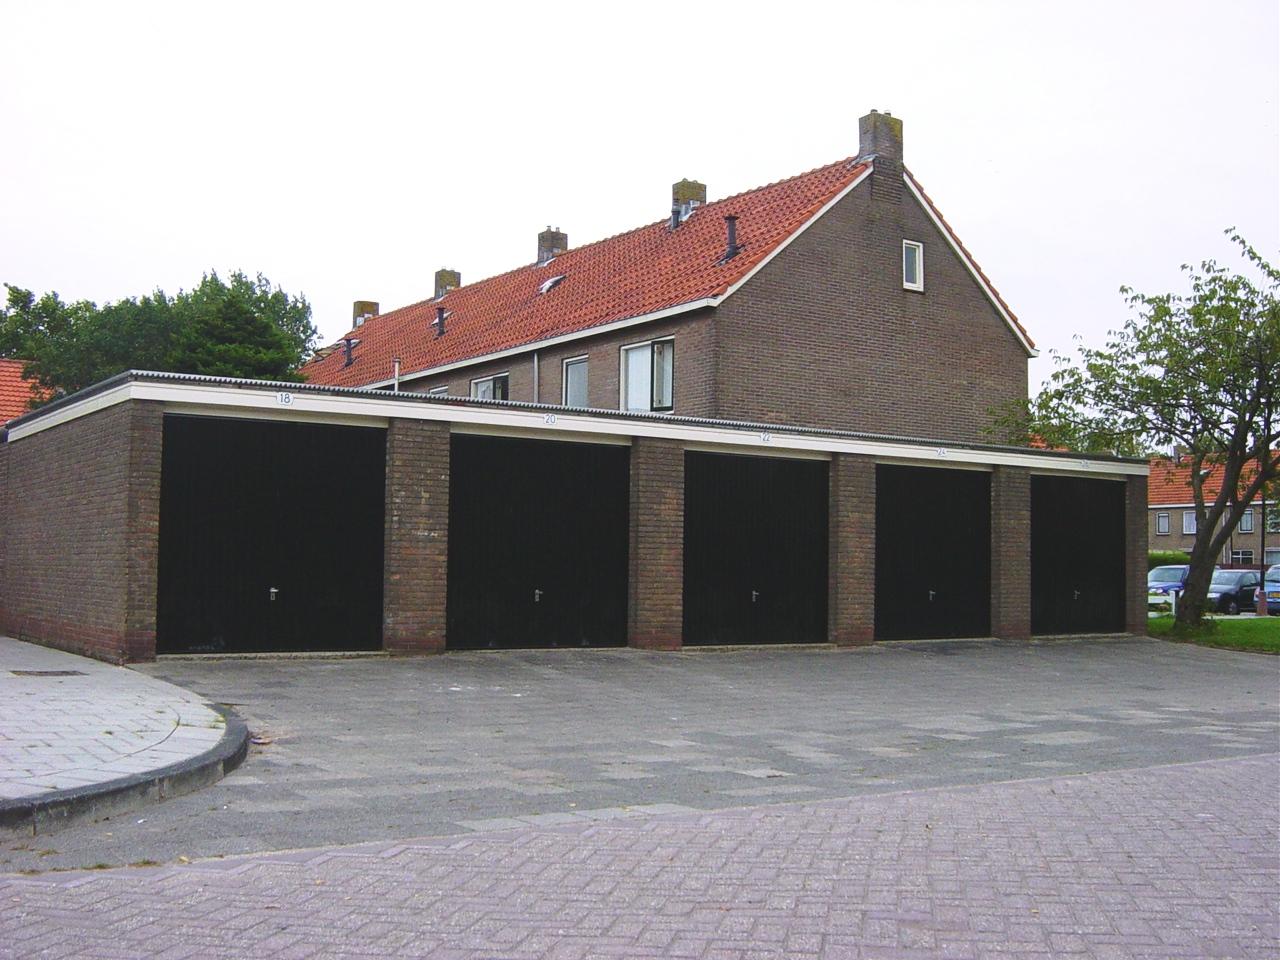 Garage Box Huren : Garagebox huren edam boxinvest garage box huren garage te huur